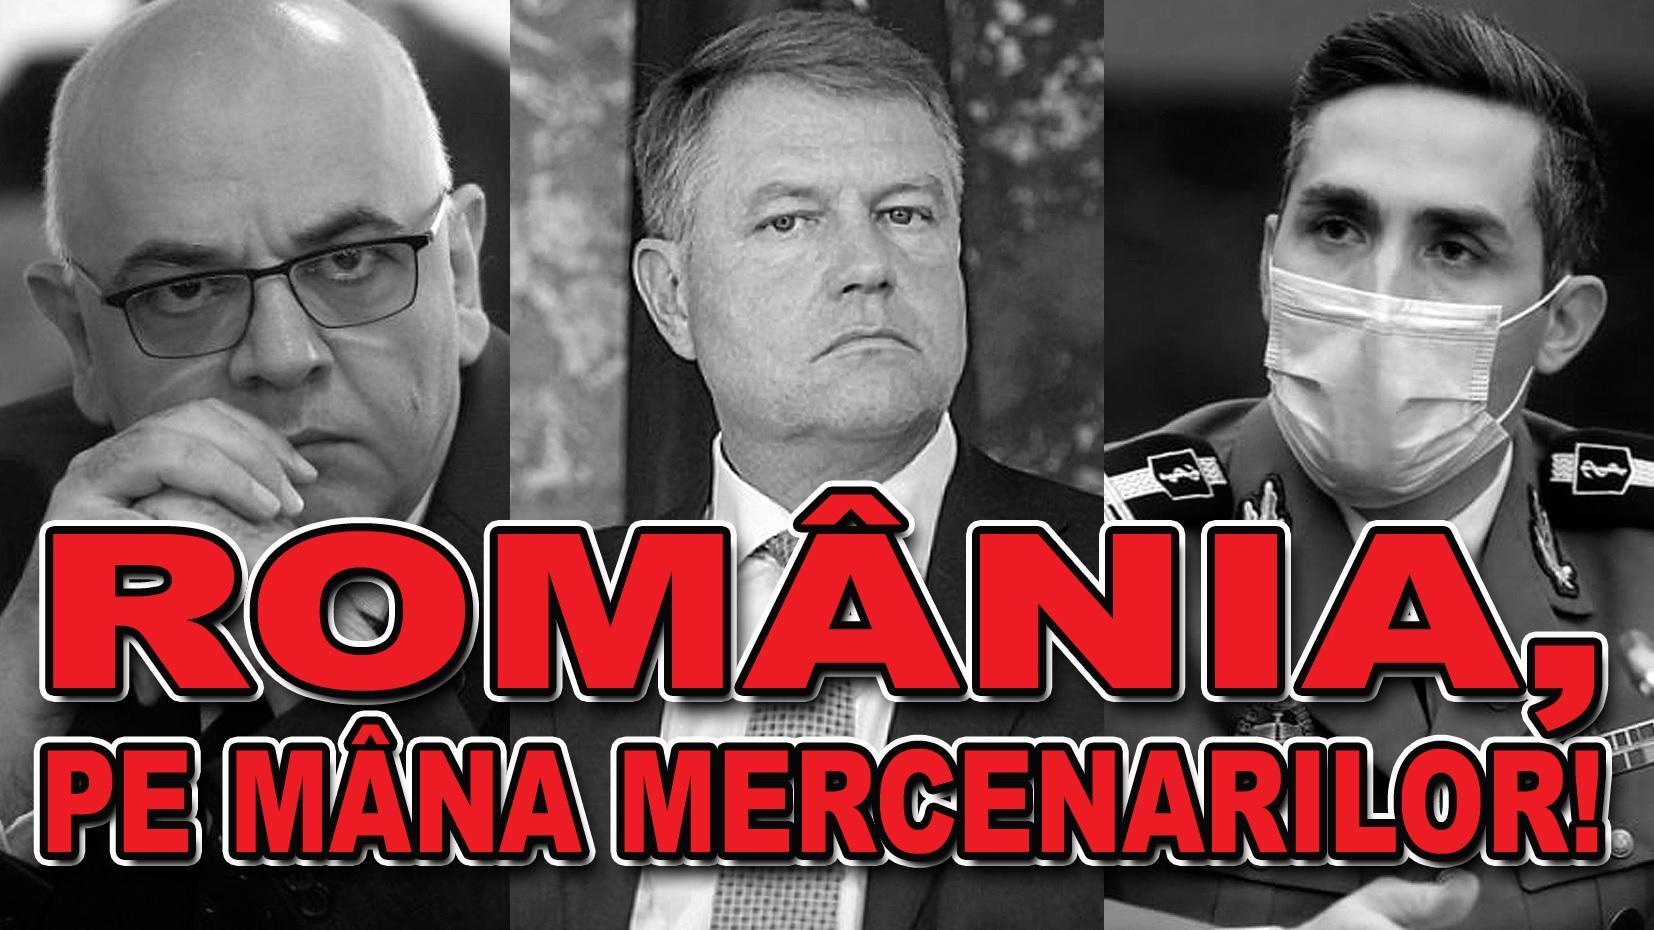 https://i1.wp.com/dantomozei.ro/wp-content/uploads/2021/10/Romania-pe-mana-mercenarilor.jpg